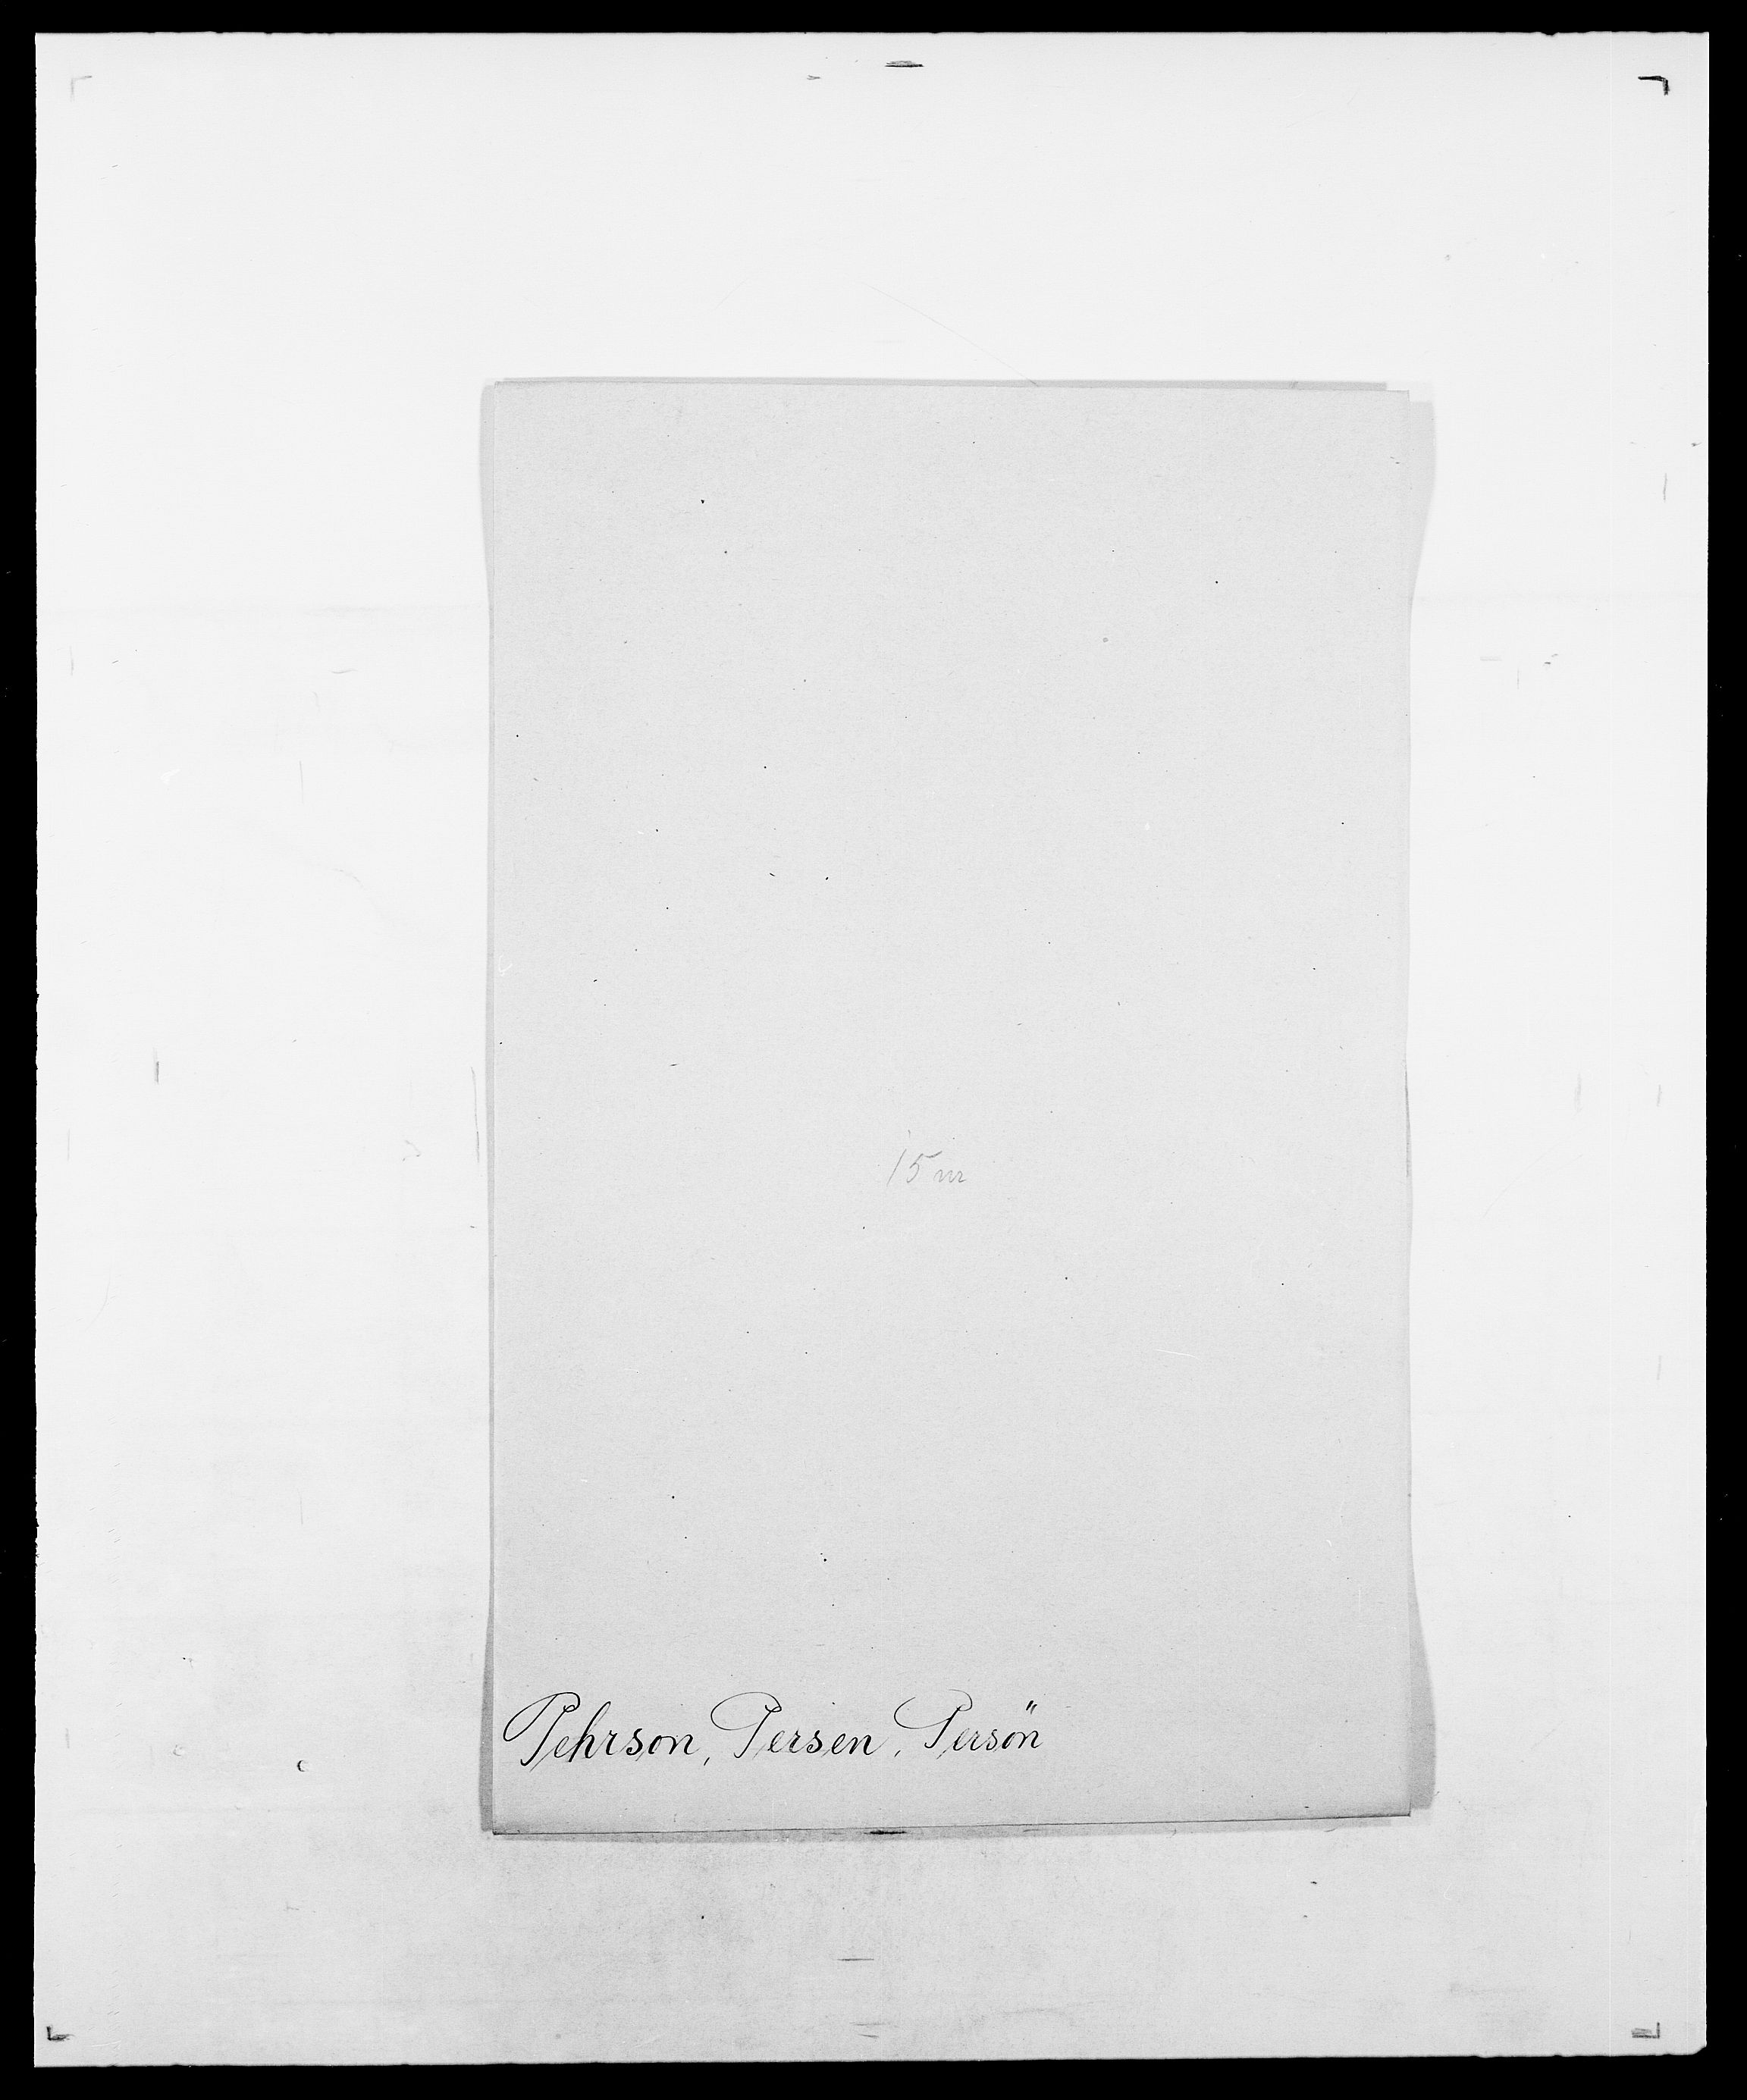 SAO, Delgobe, Charles Antoine - samling, D/Da/L0030: Paars - Pittelkov, s. 315